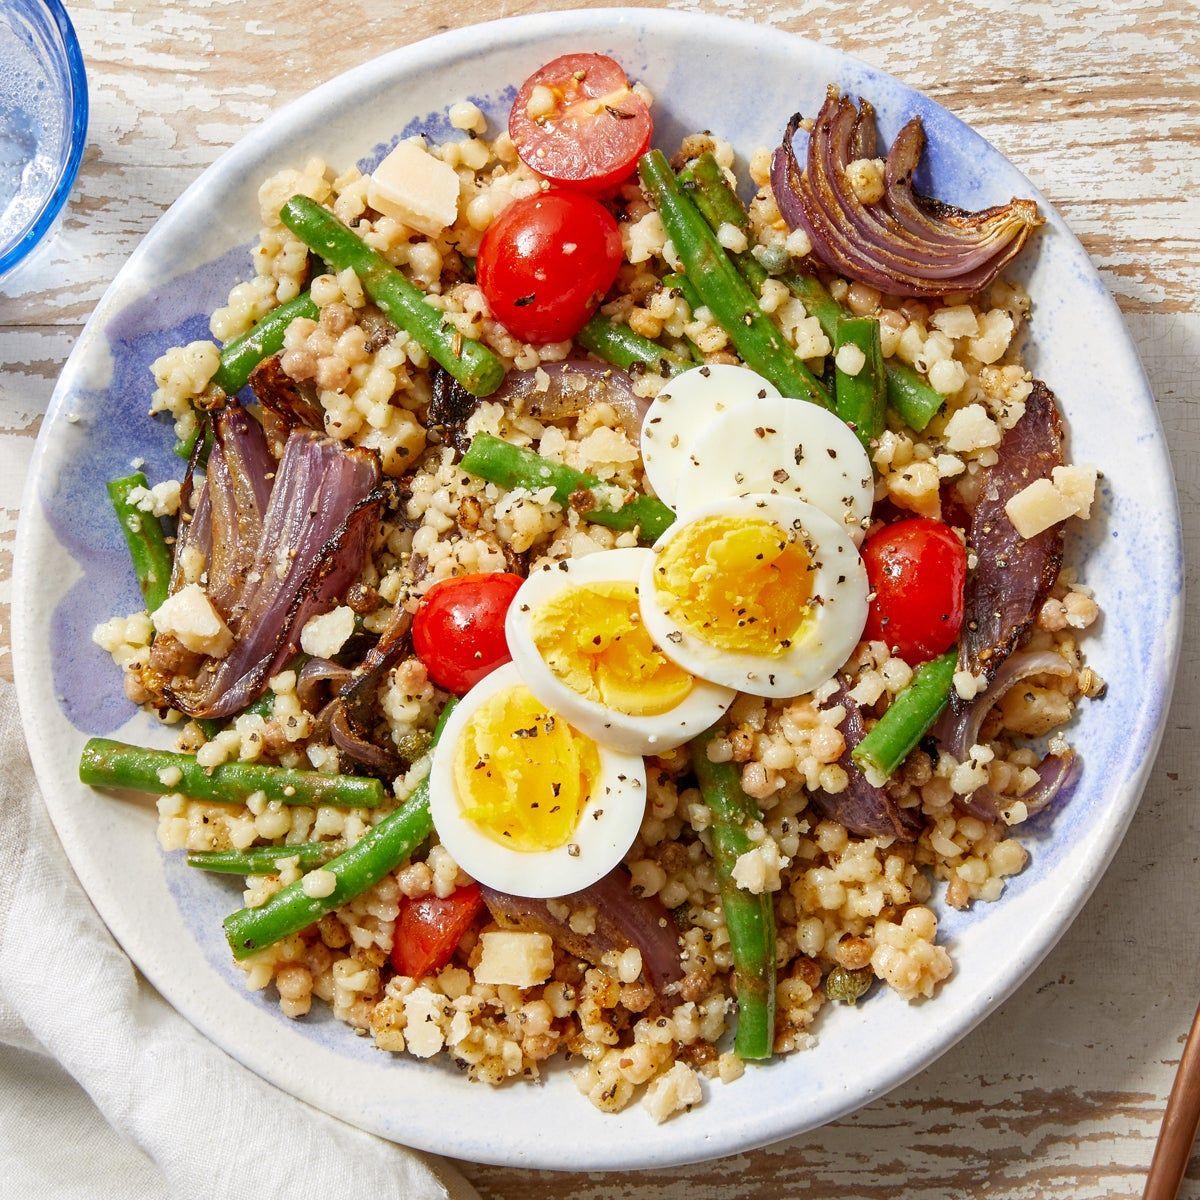 Summer Fregola Sarda Pasta with Green Beans, Tomatoes & Hard Boiled Eggs